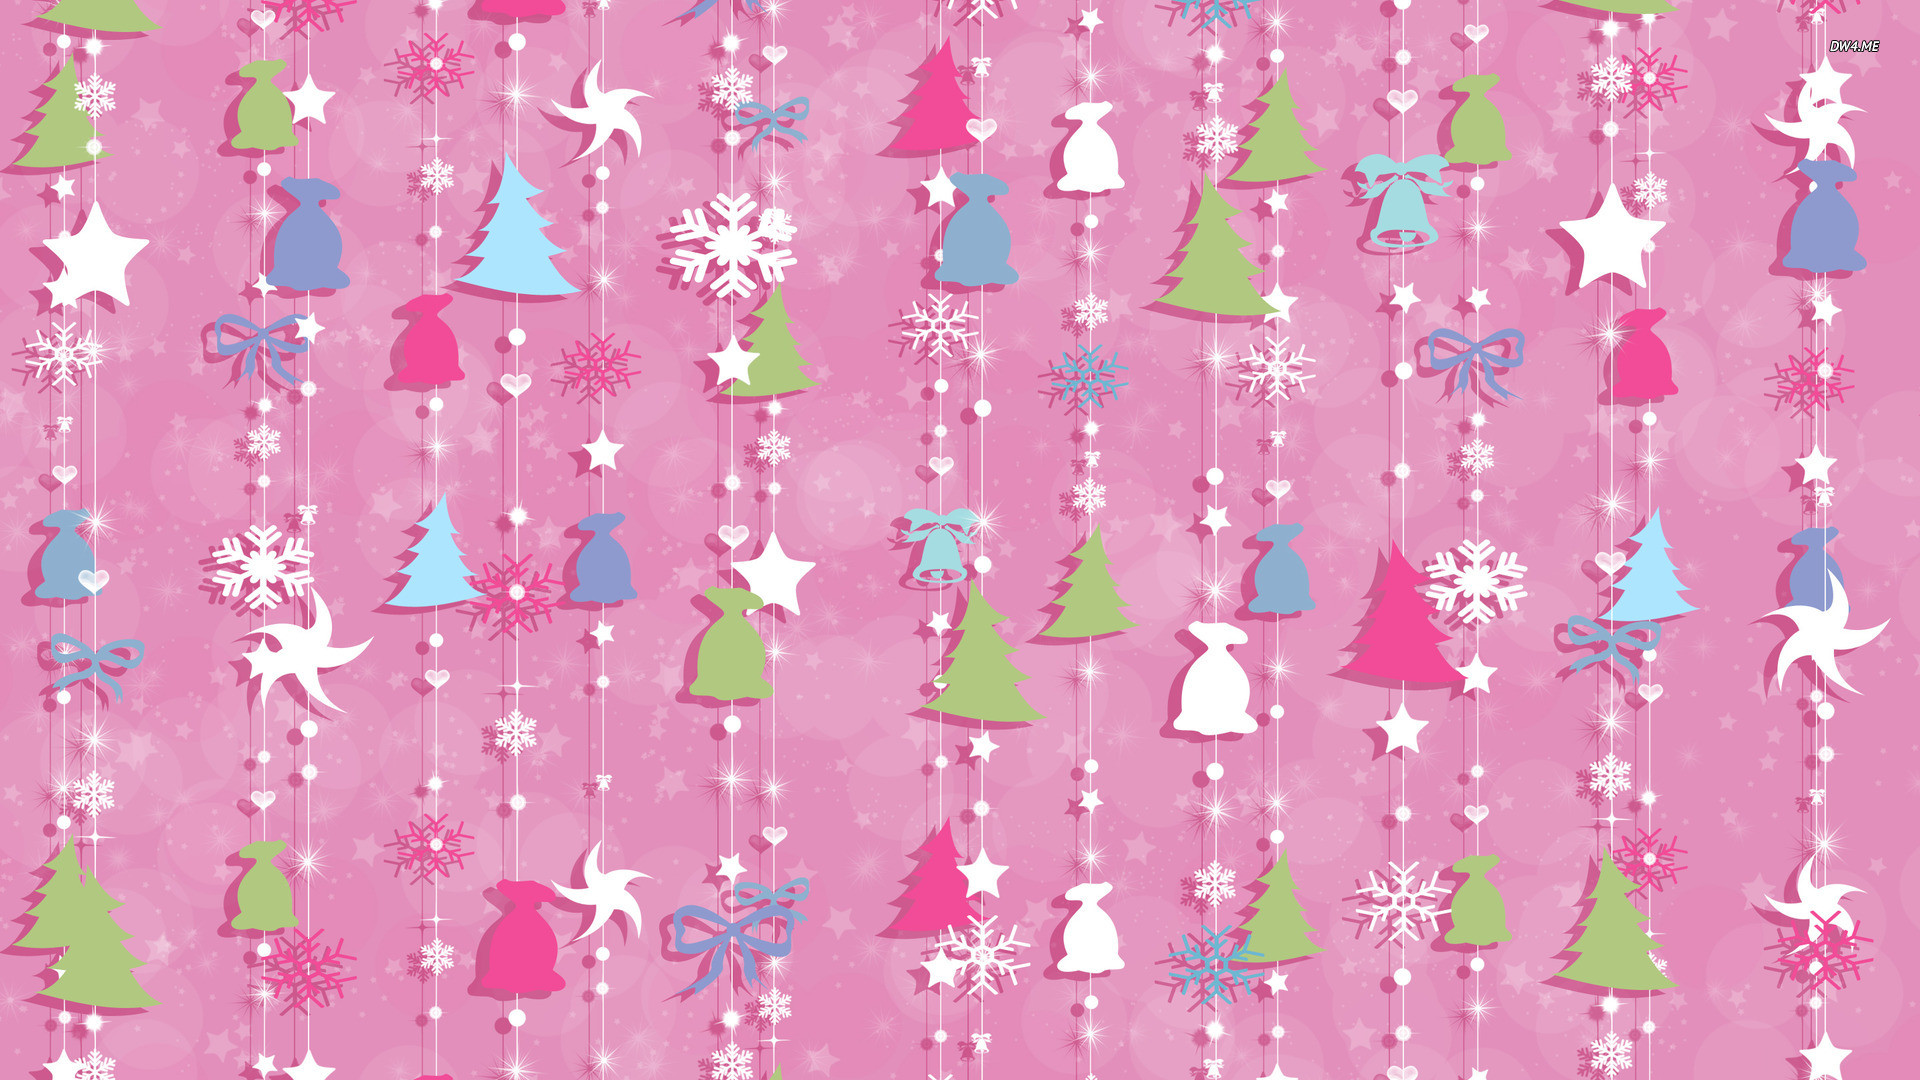 … Christmas garlands